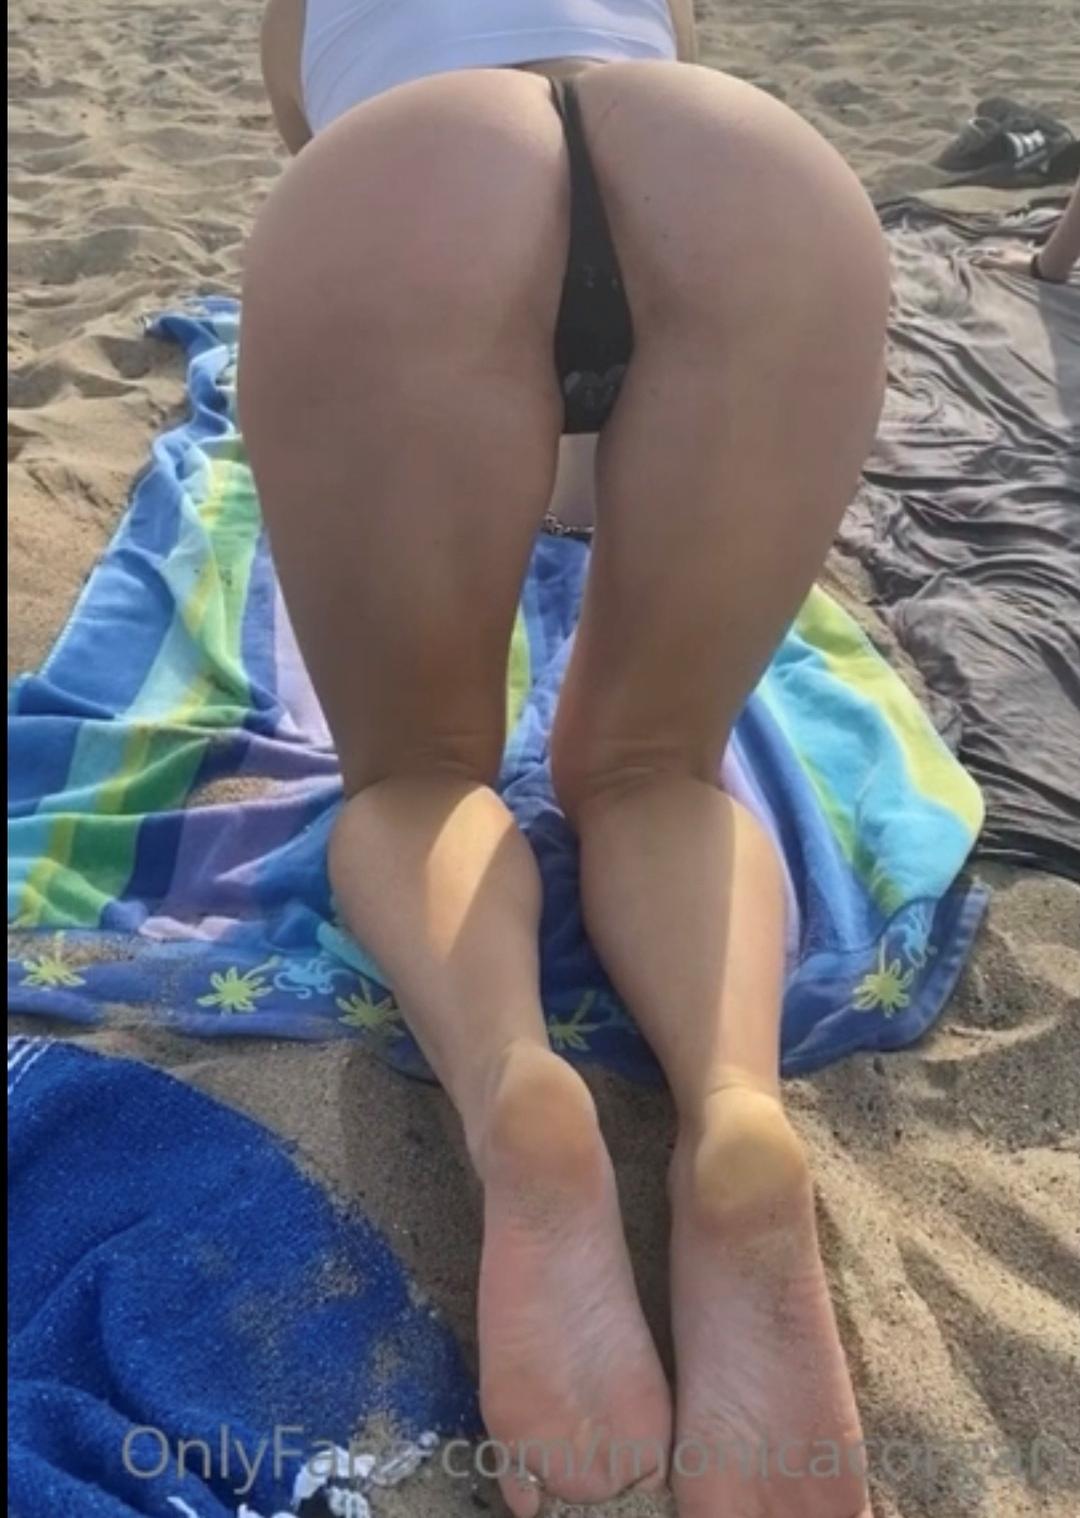 Monica Corgan Monicacorgan Onlyfans Nudes Leaks 0007